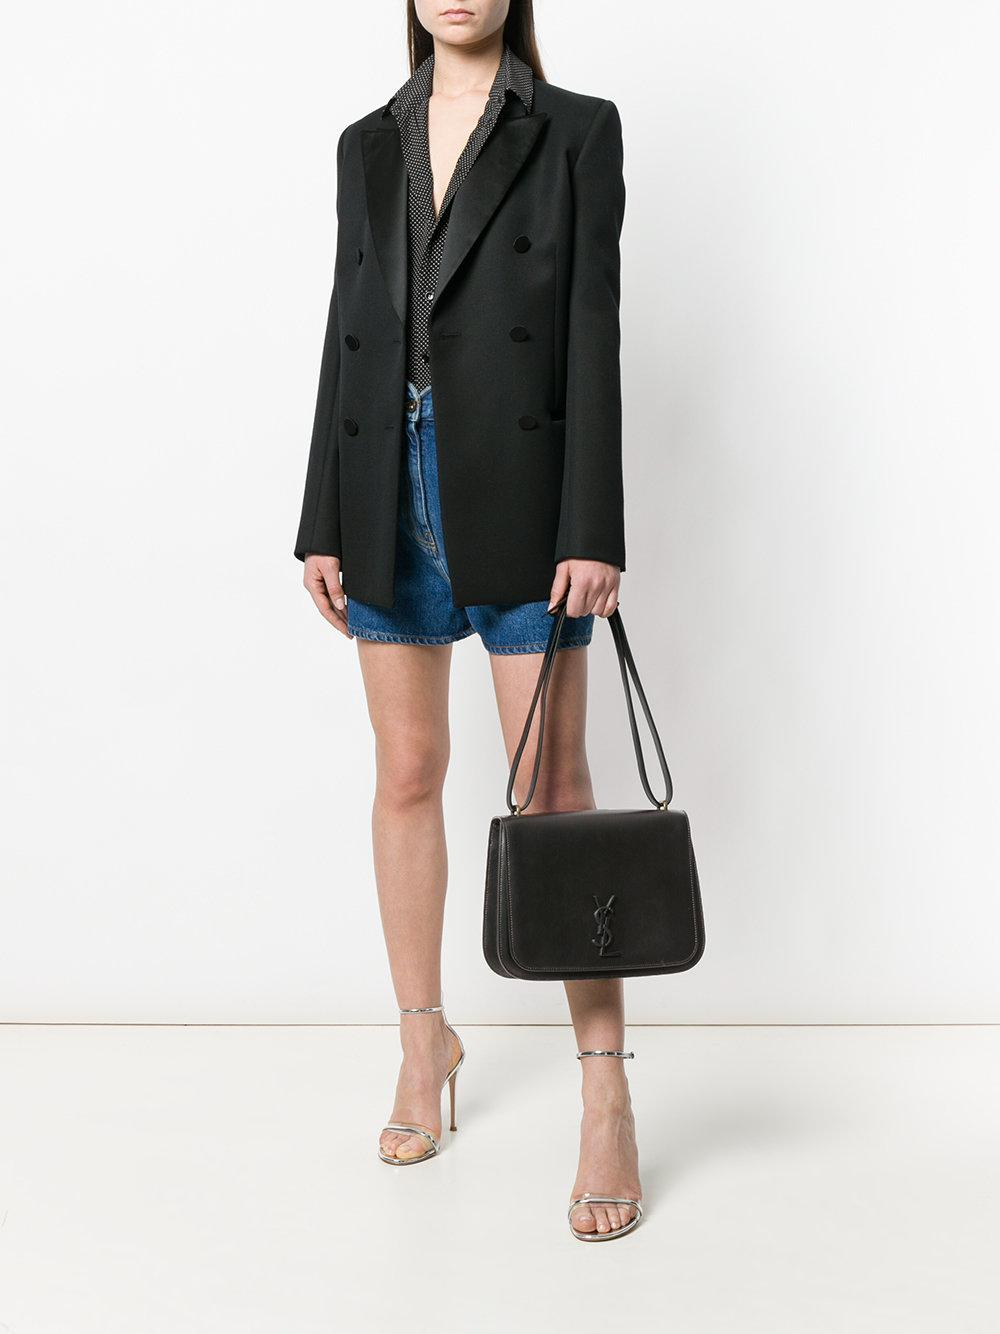 0d5c9a4ea8 Lyst - Saint Laurent Medium Spontini Satchel Bag in Black